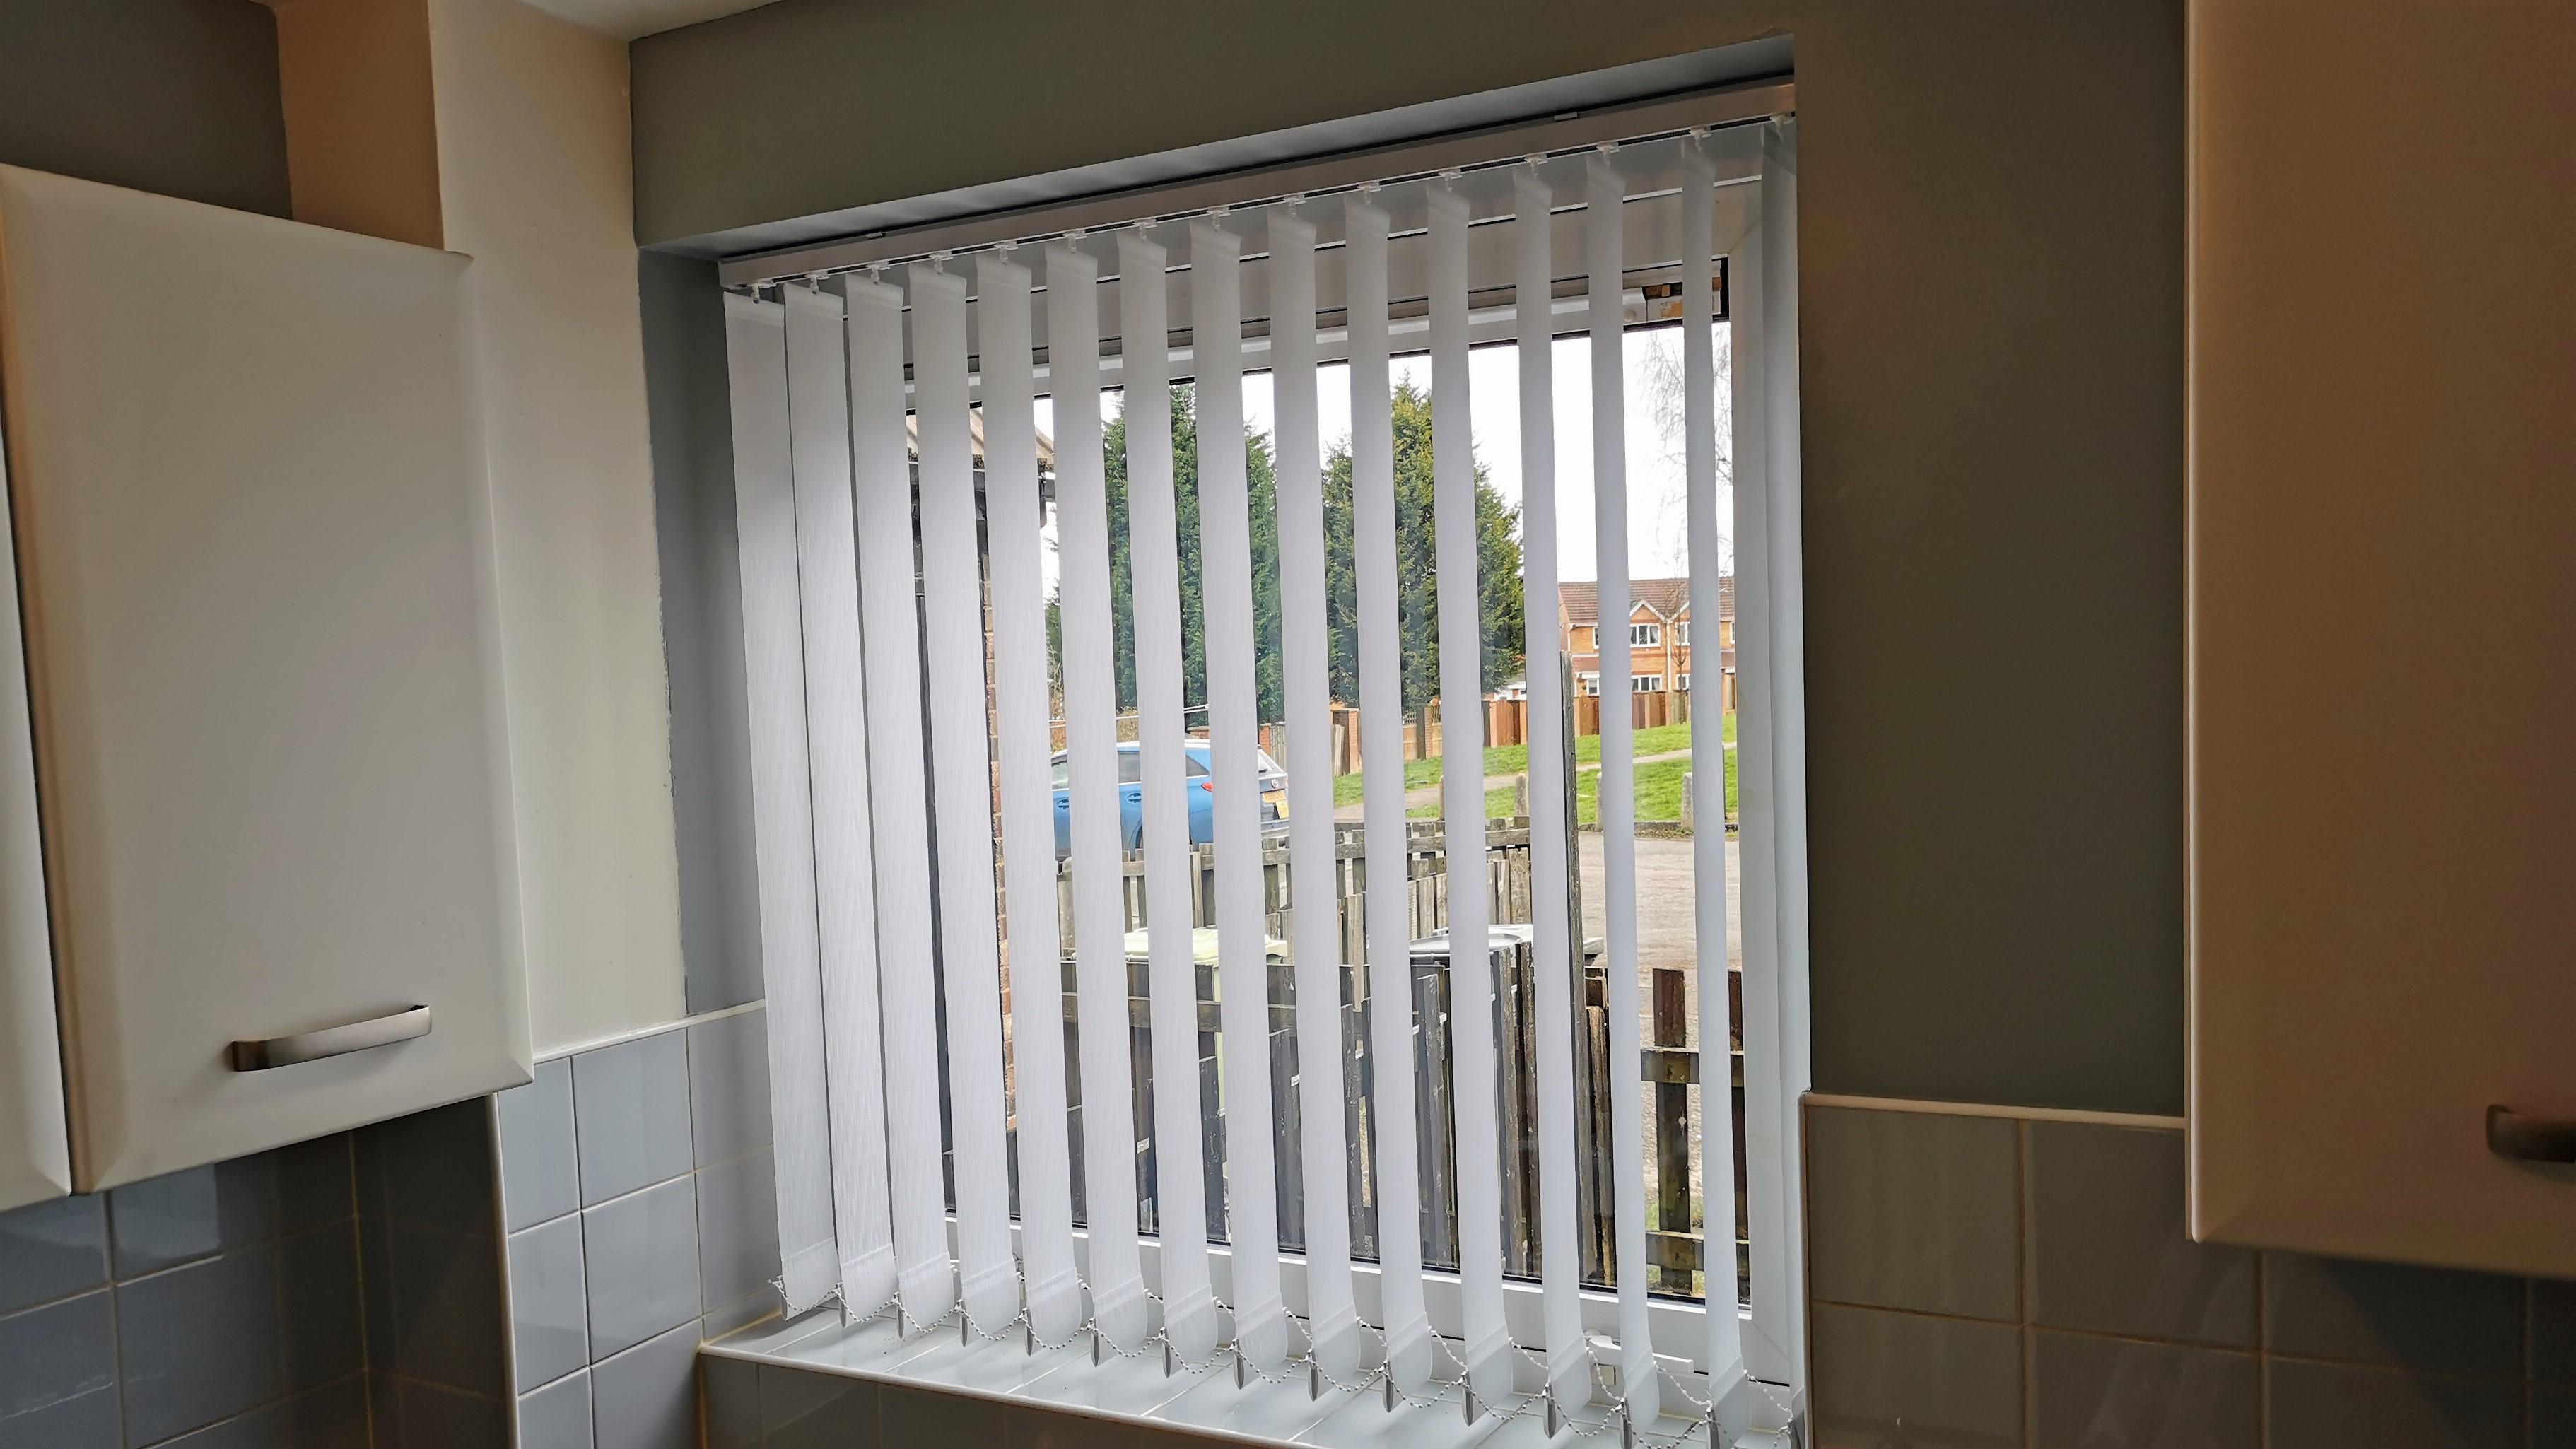 Vertical blinds in kitchen